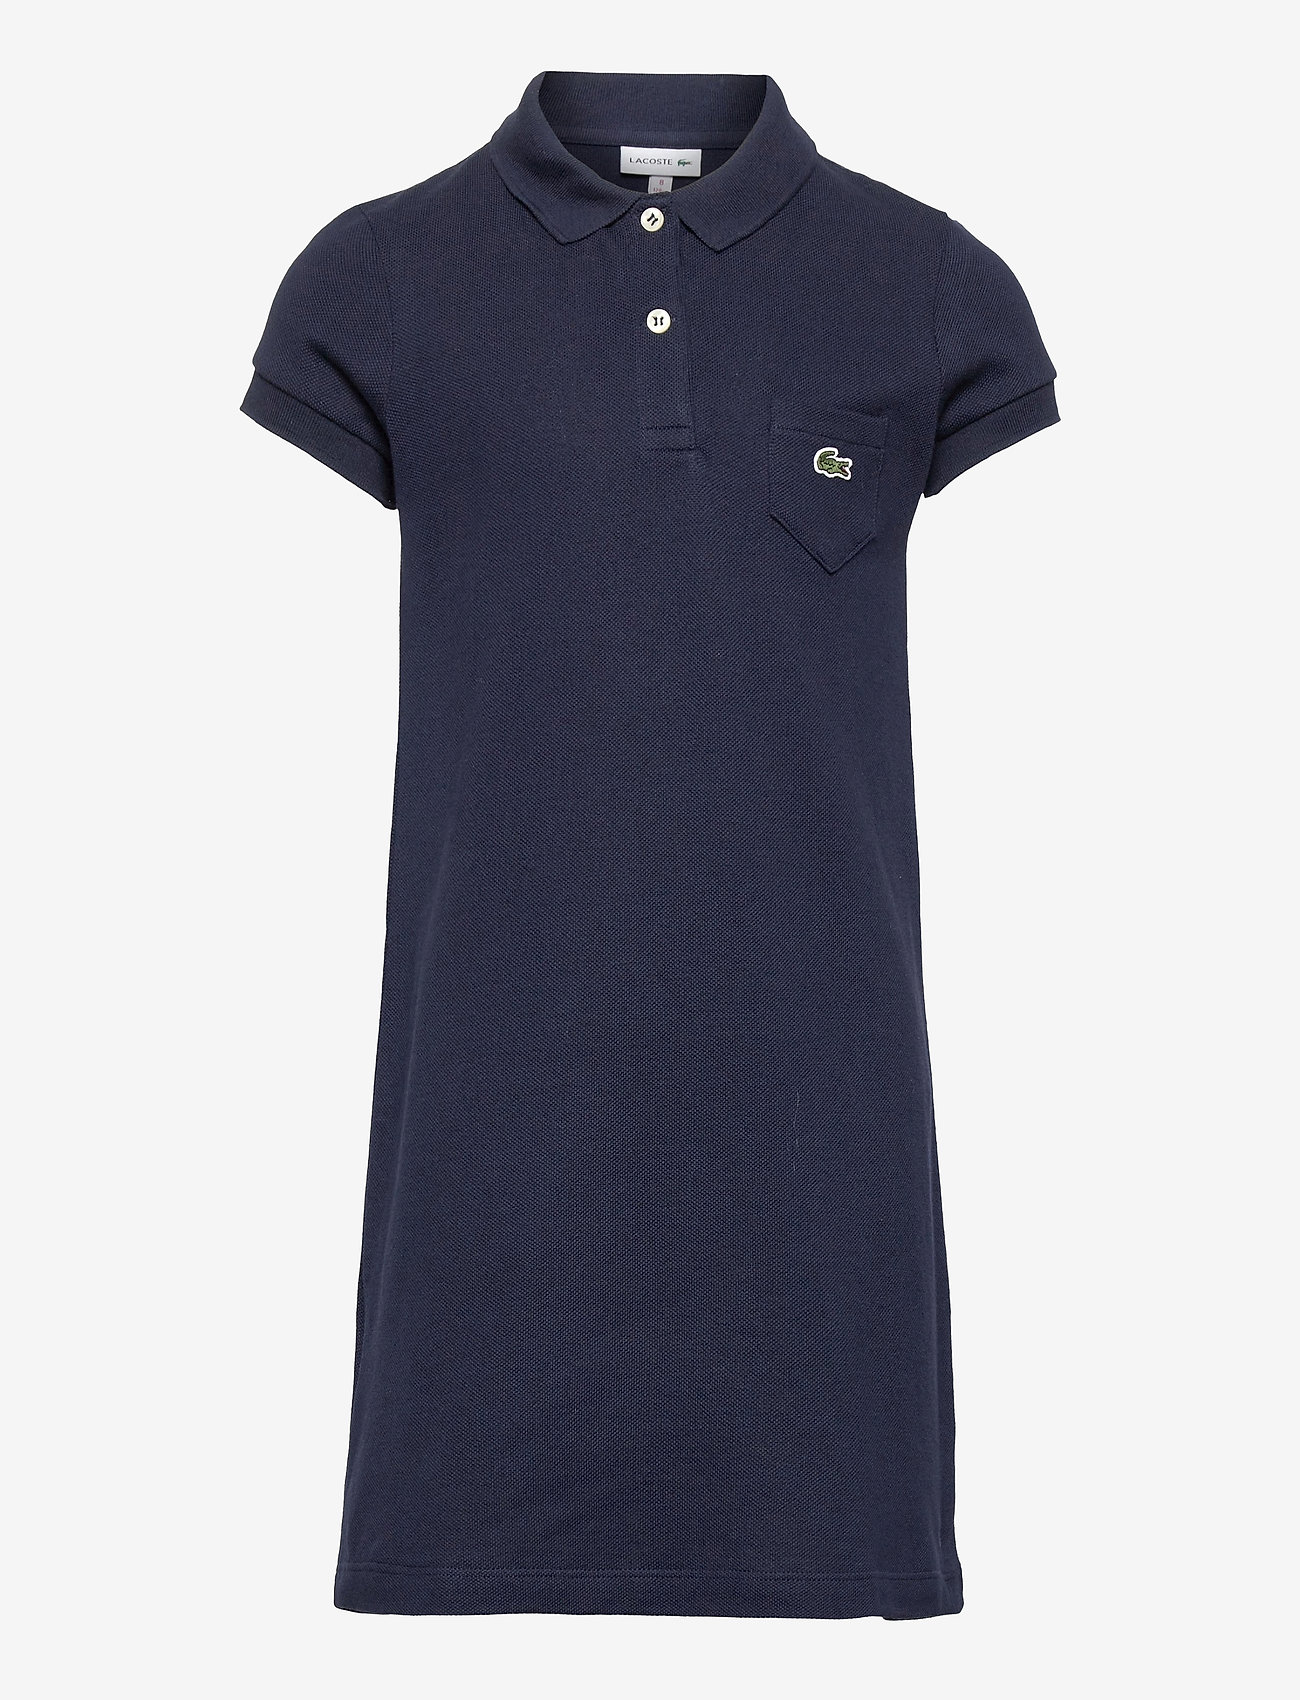 Lacoste - Children dress - jurken - navy blue - 0